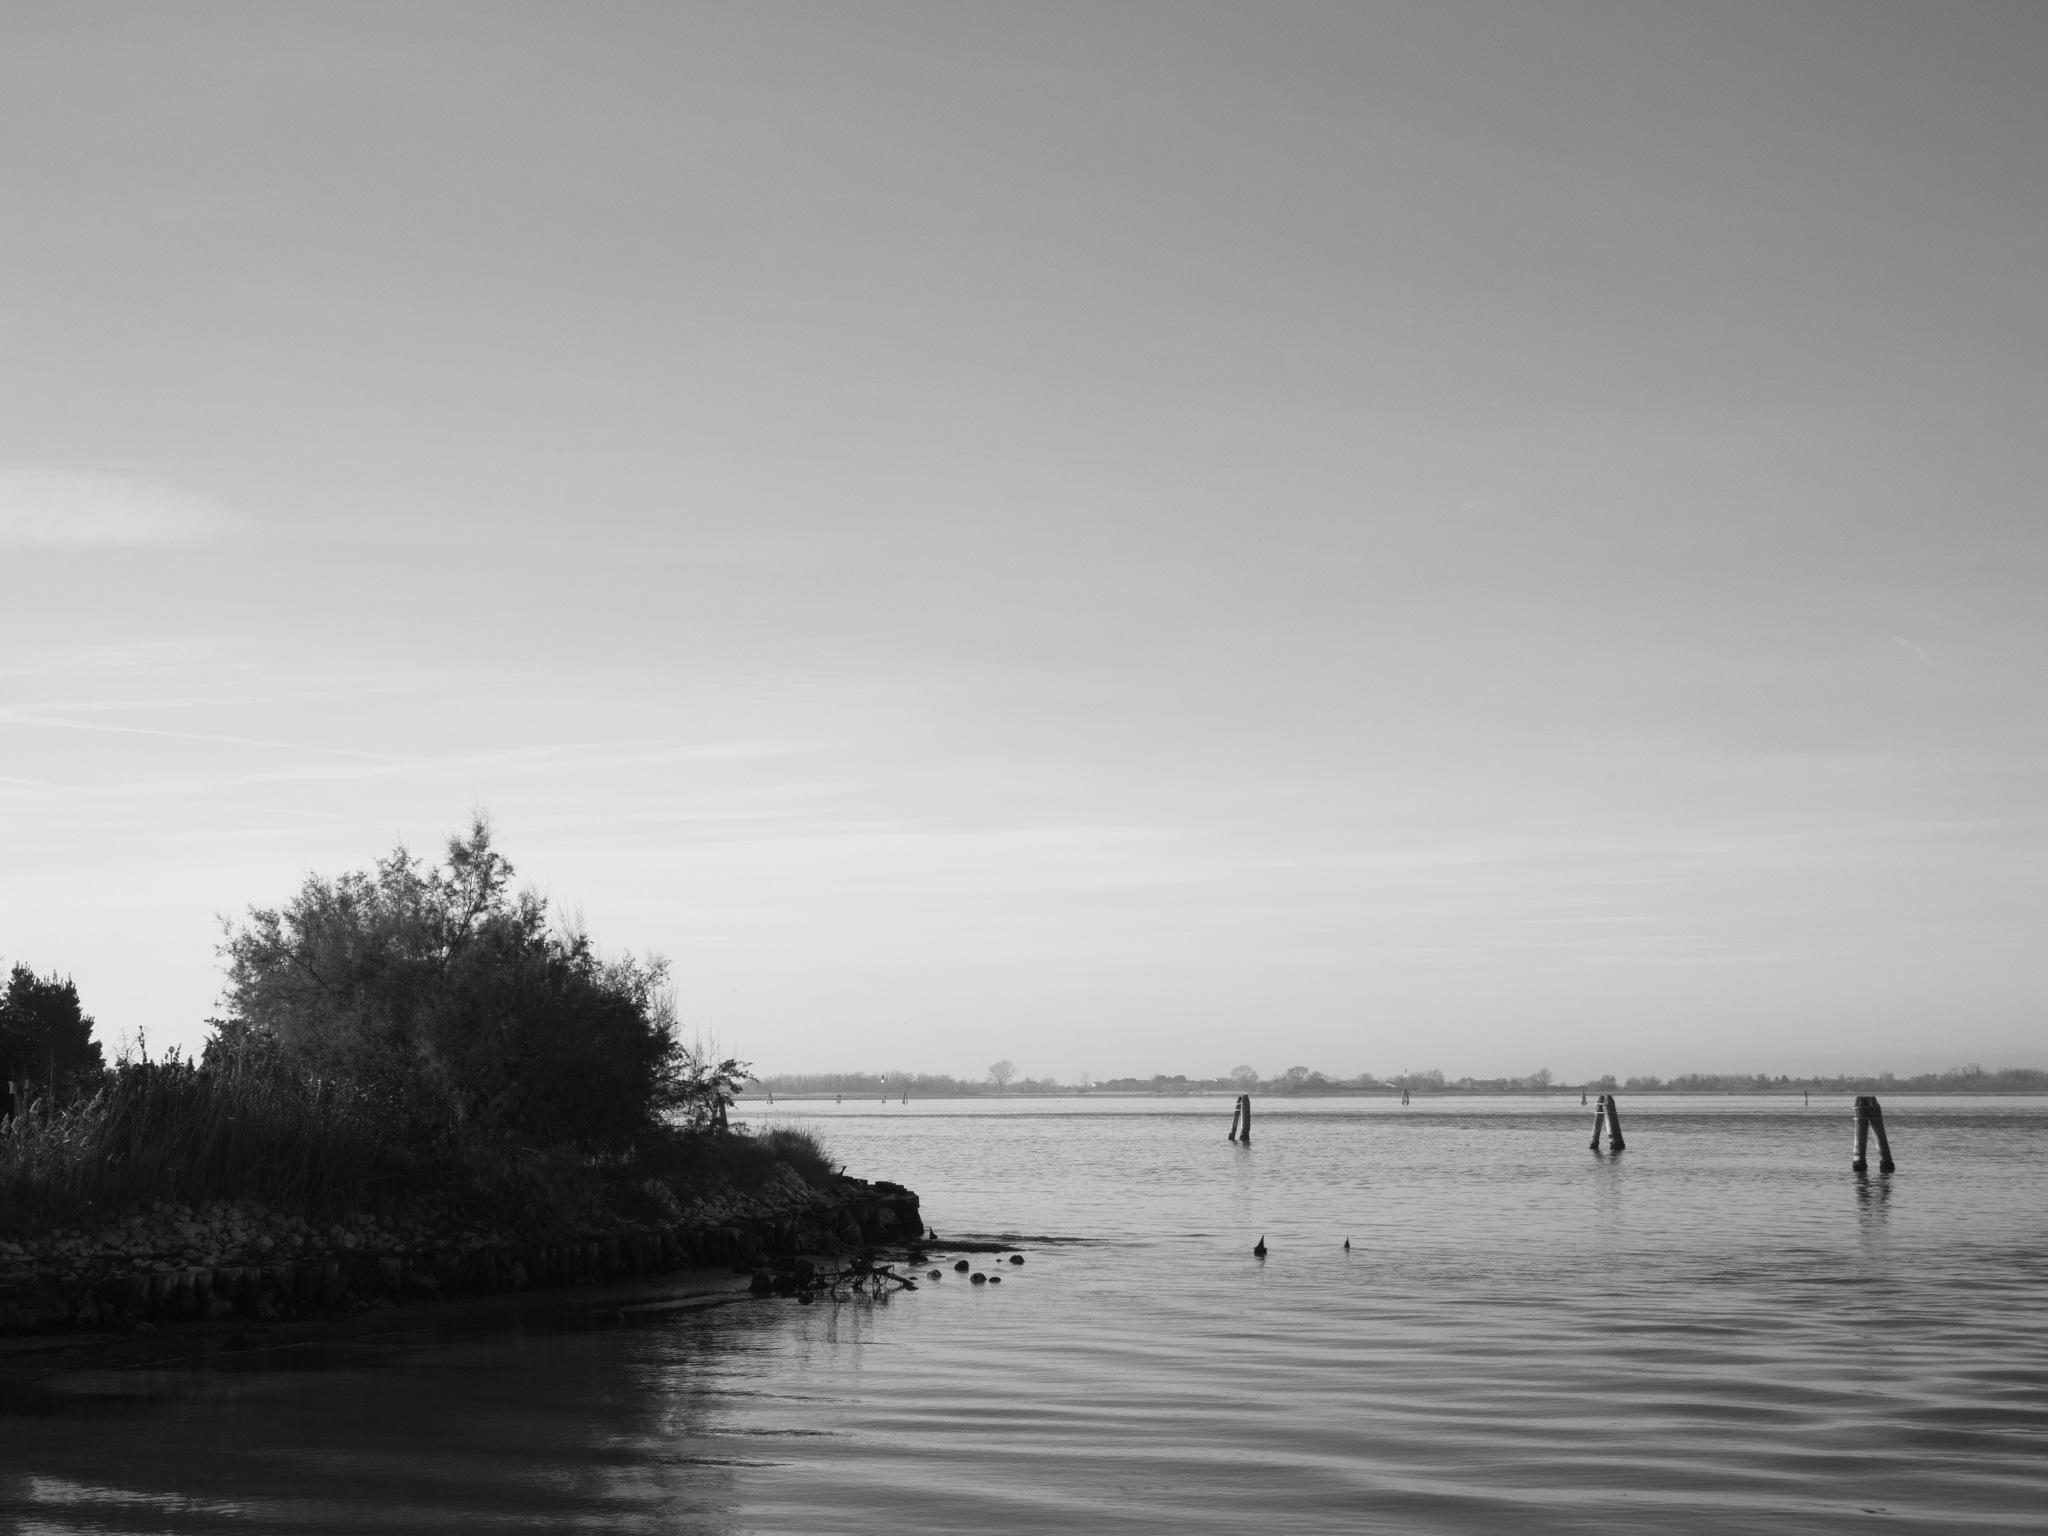 Venice lagoon by Rosinante